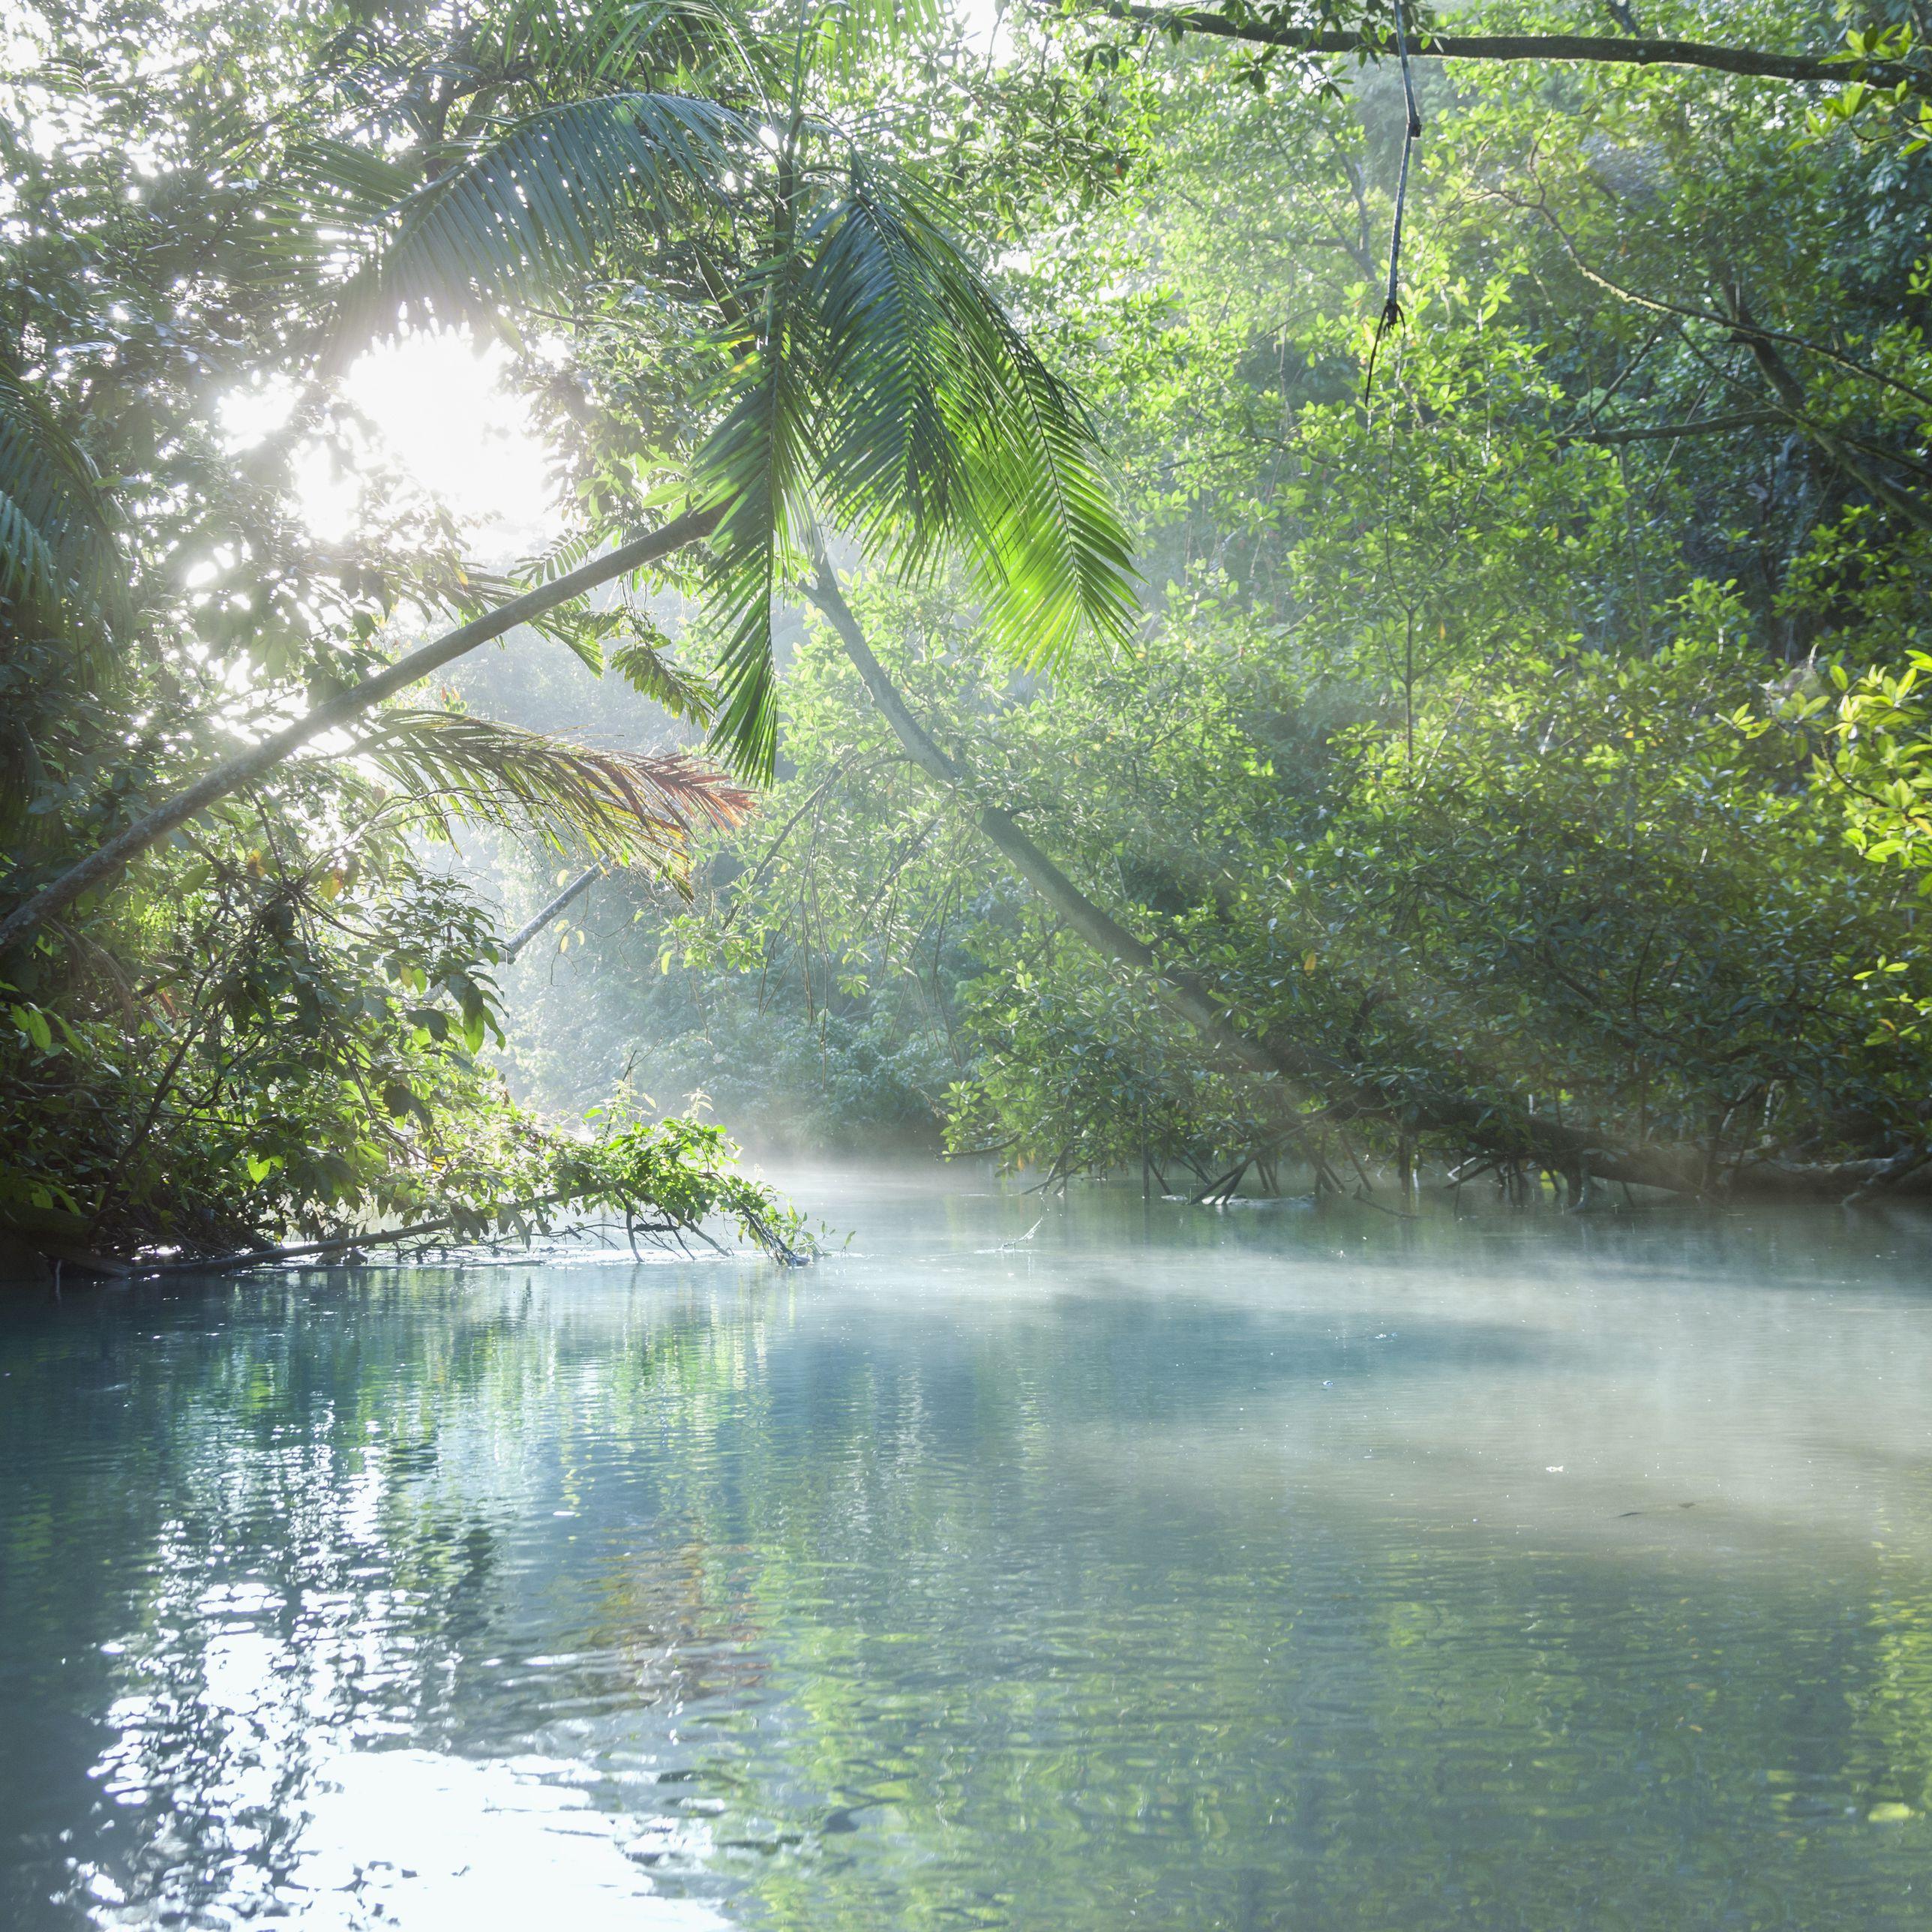 Orinoco River System In South America